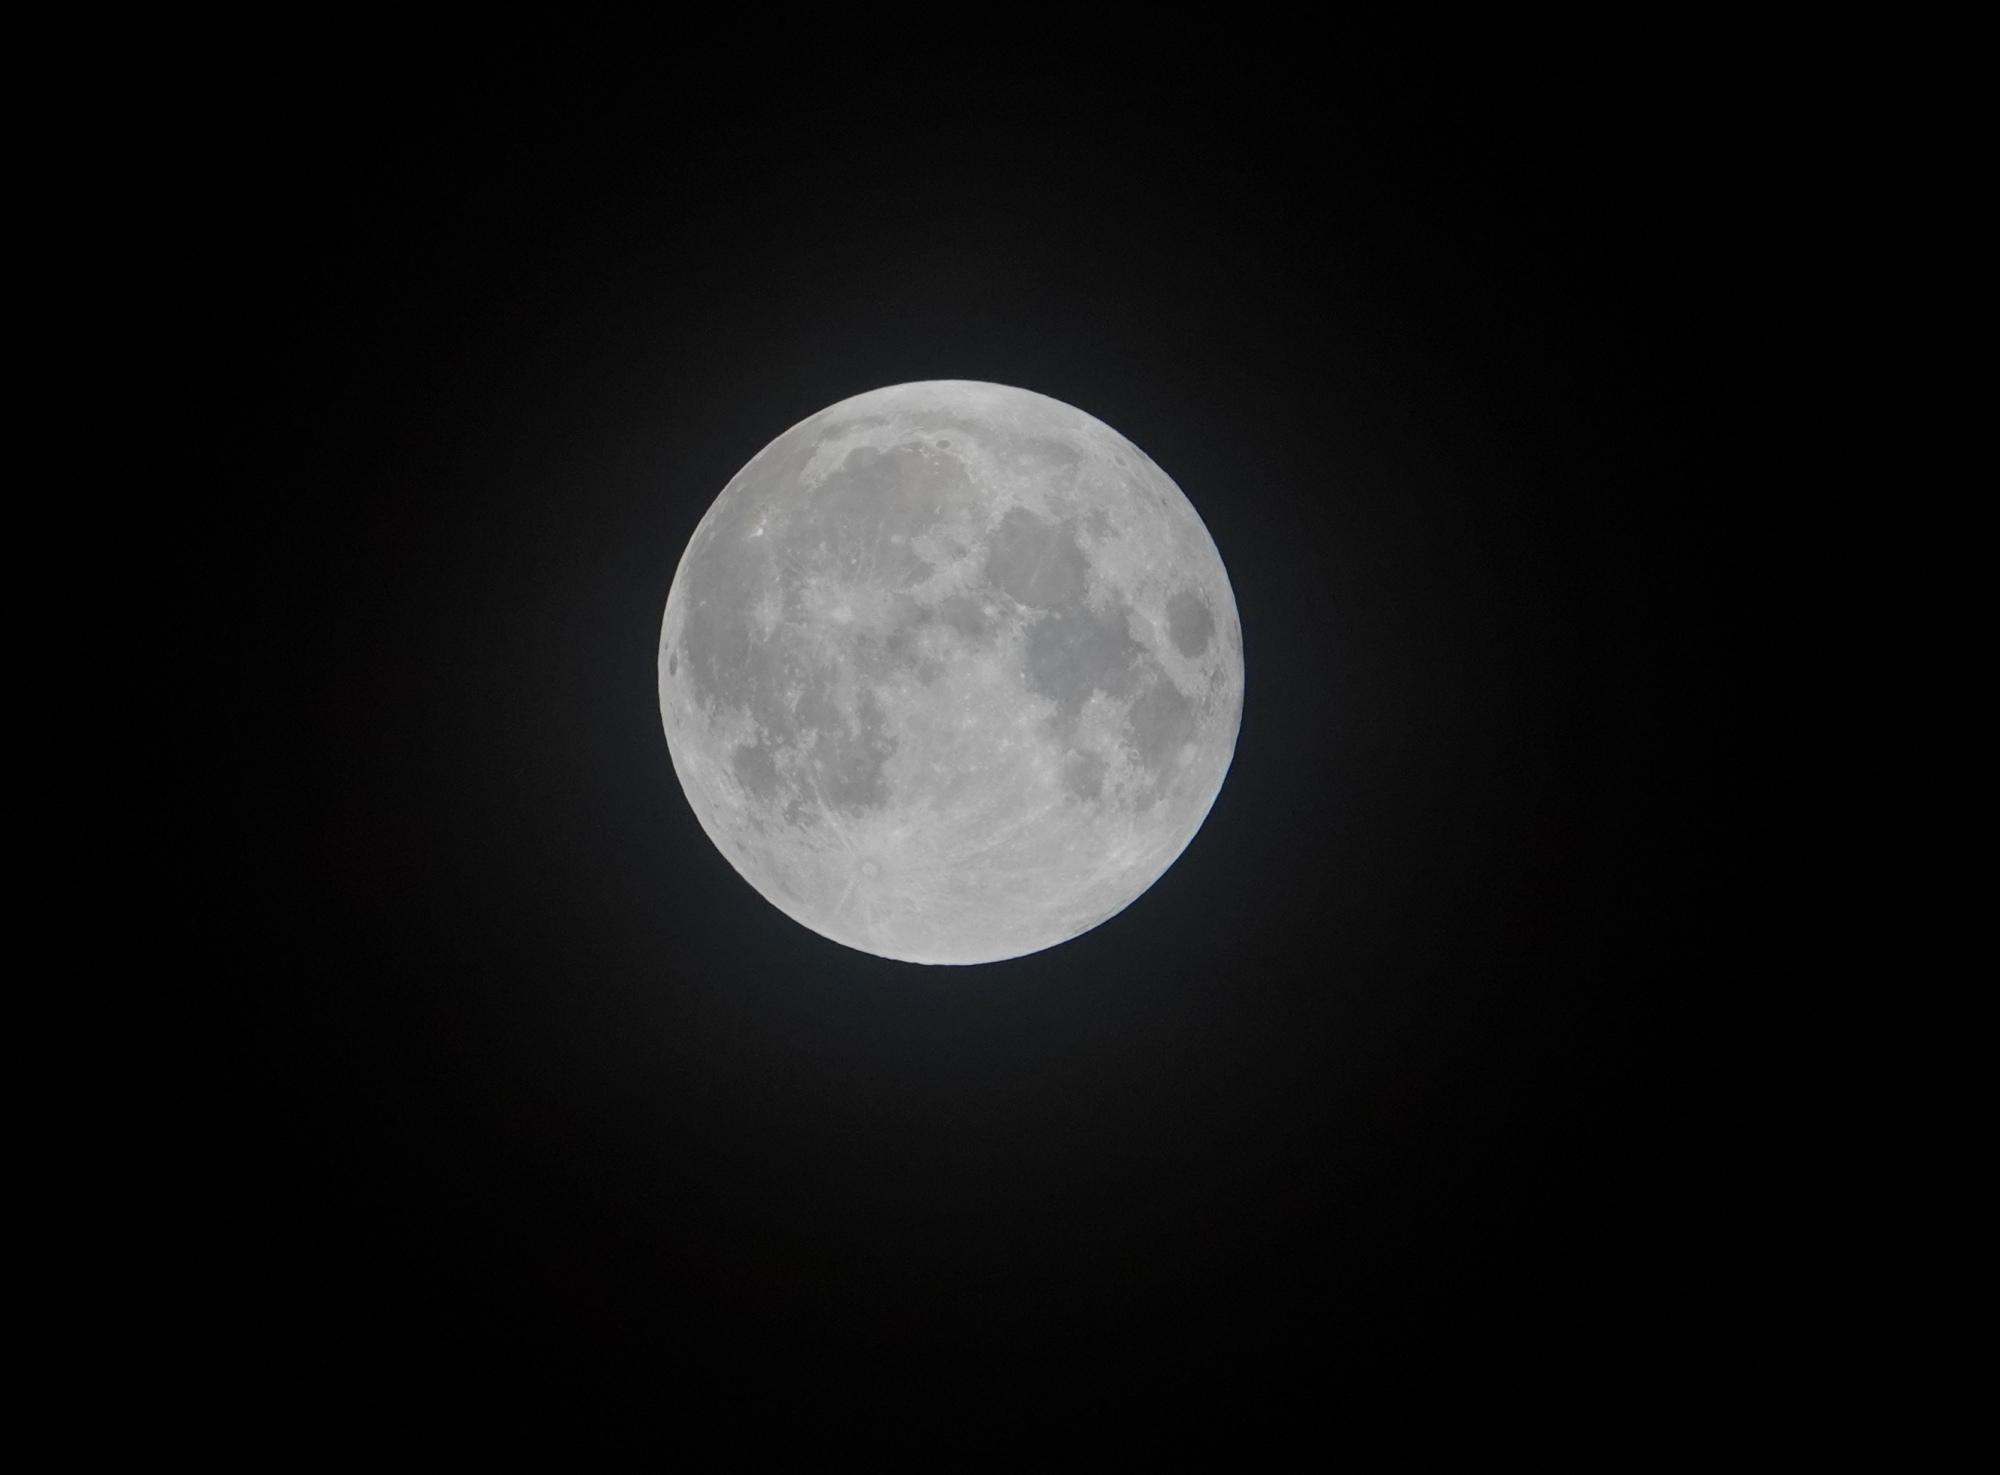 5d2f3fbf17971_lune(1).thumb.JPG.718ccd6cb86c61443f25a2a3168fd522.JPG